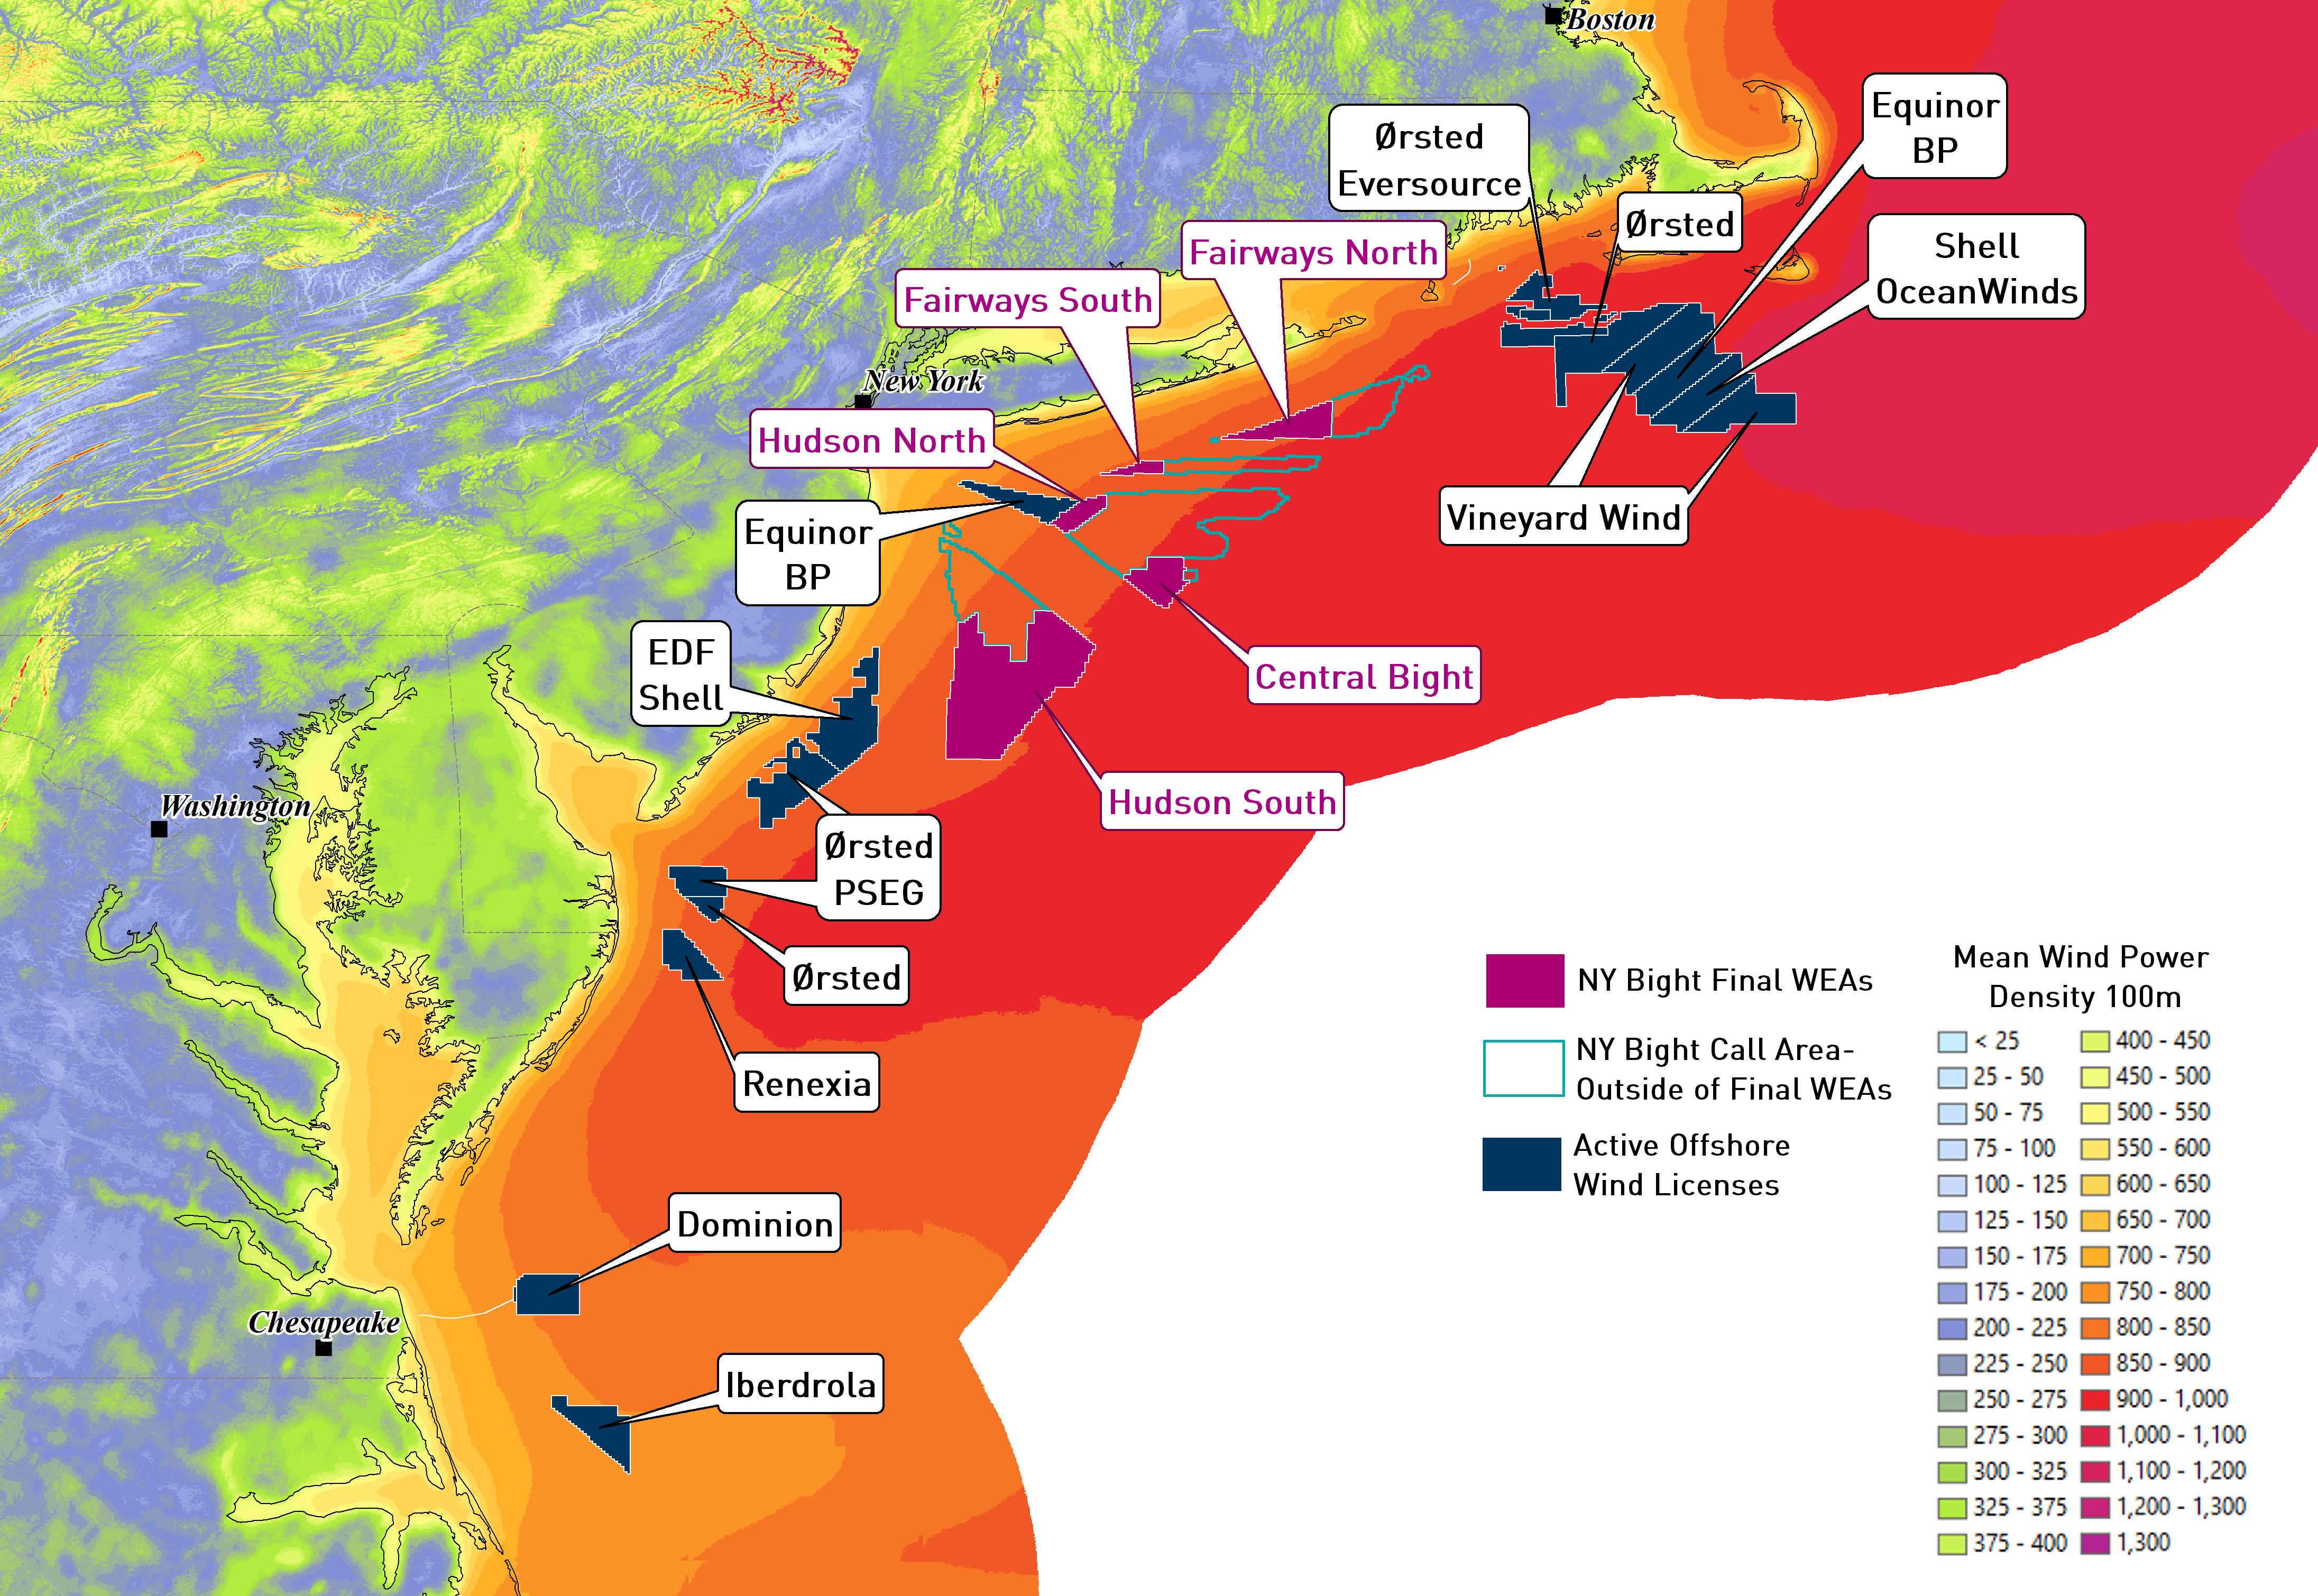 East Coast Wind Activity map- updated WEAs